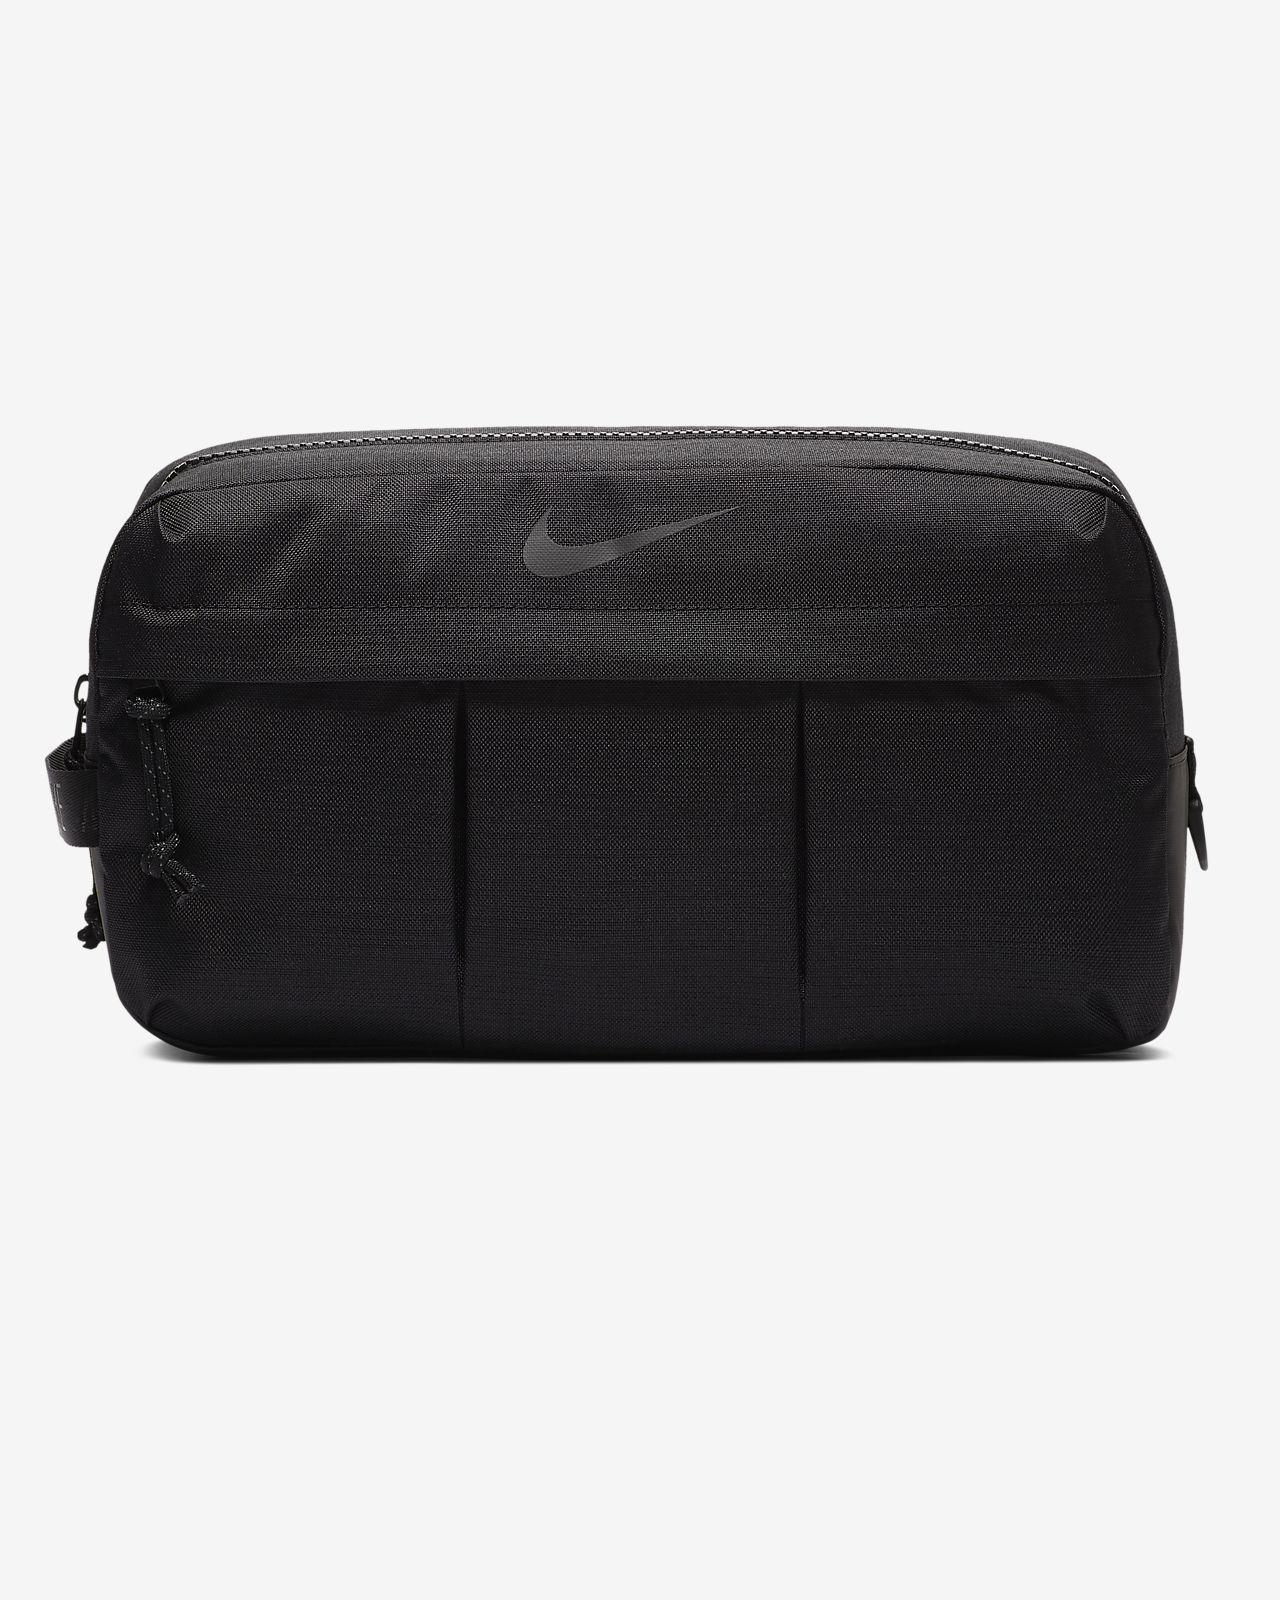 De Training Nike Vapor À Sac Chaussures zGqUVSMjLp